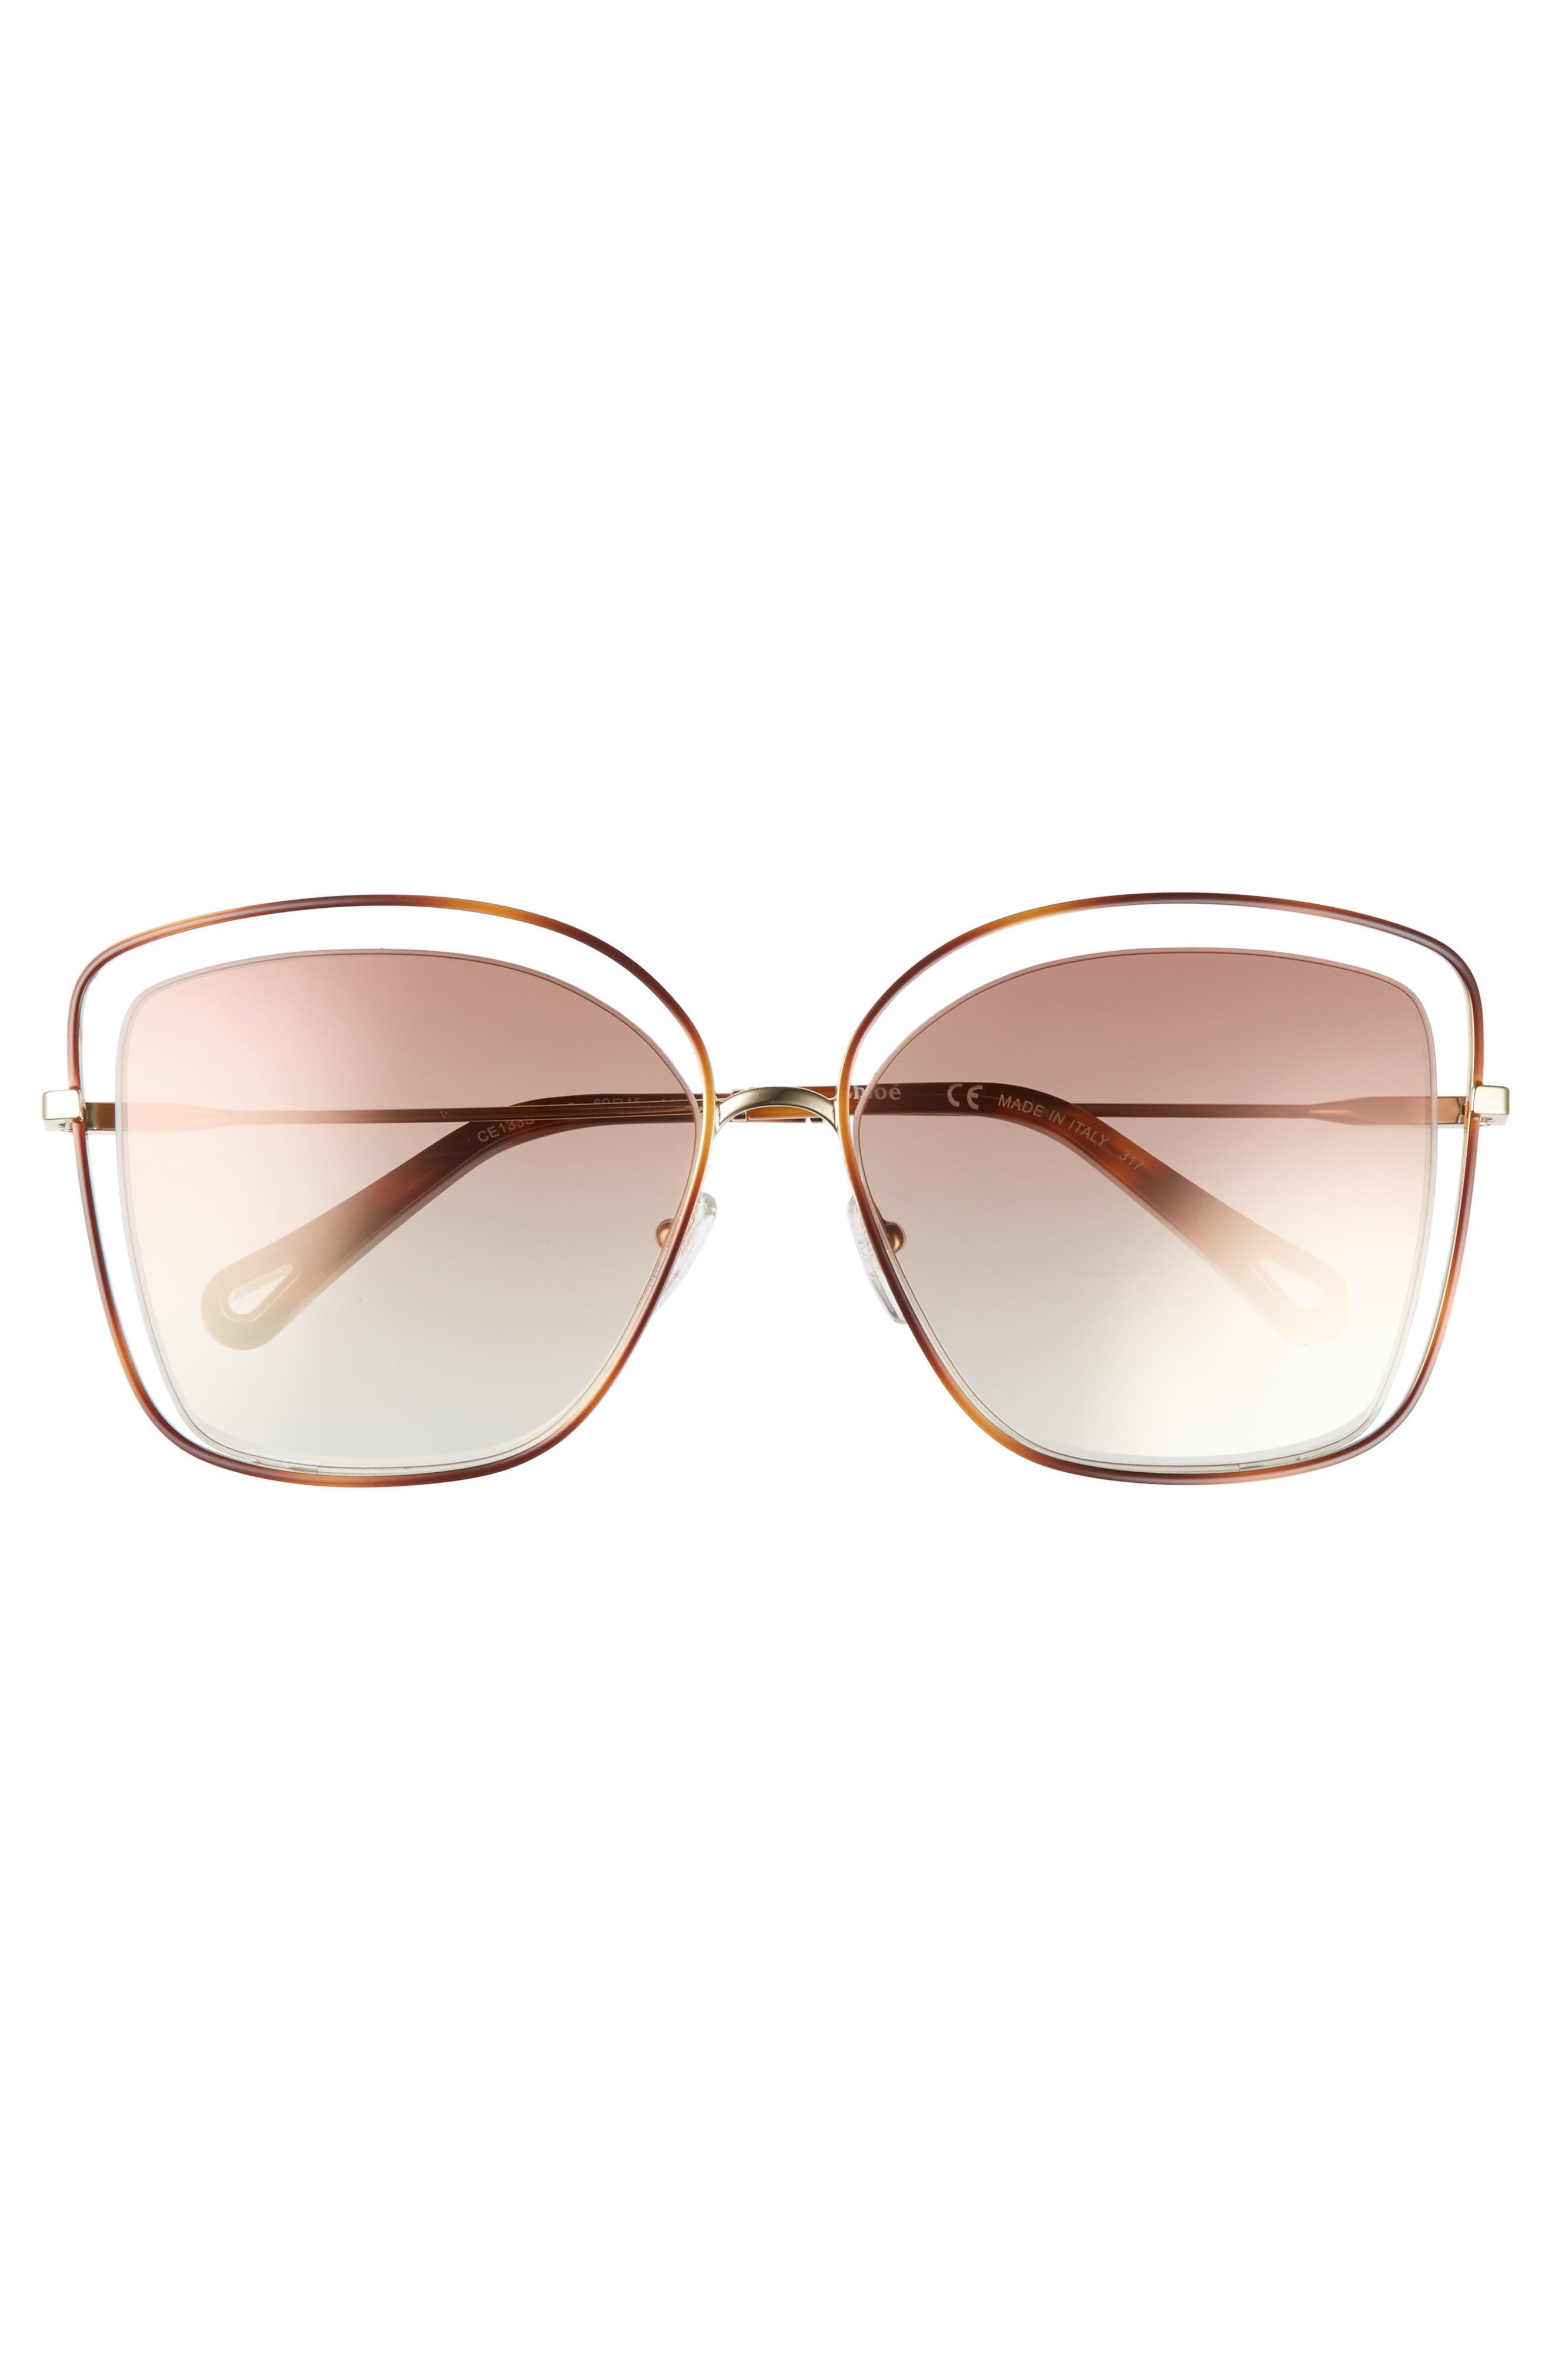 60mm Halo Frame Sunglasses,                             Alternate thumbnail 3, color,                             HAVANA/ BRONZE